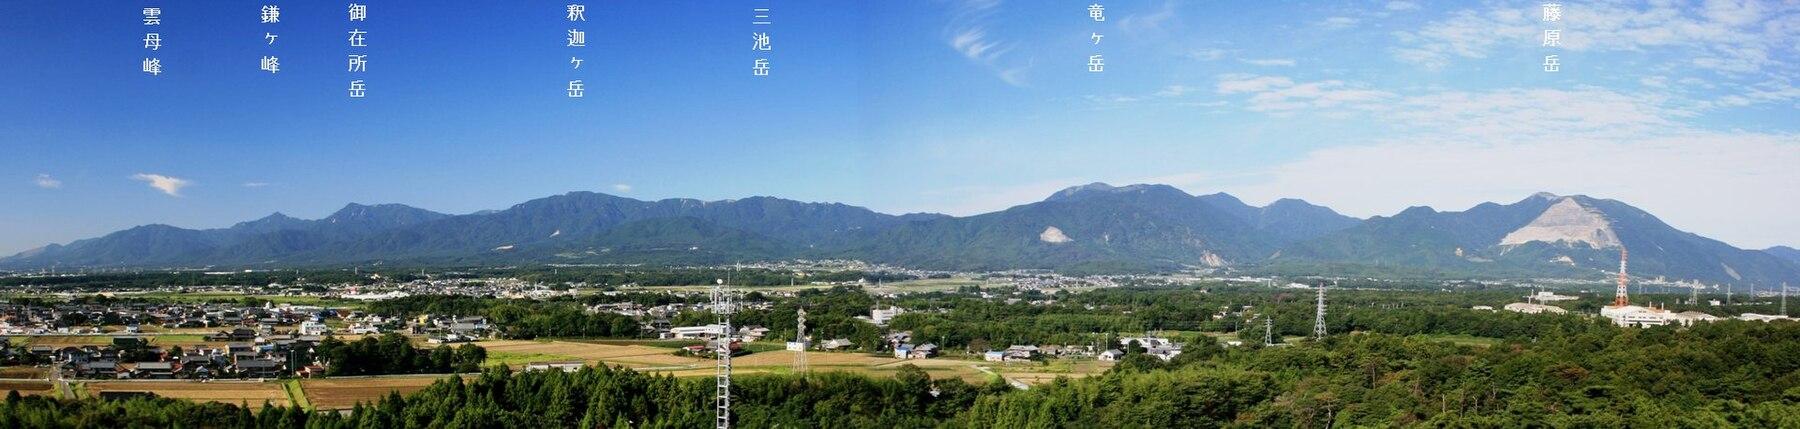 Suzuka Mountains from Inabe City.jpg